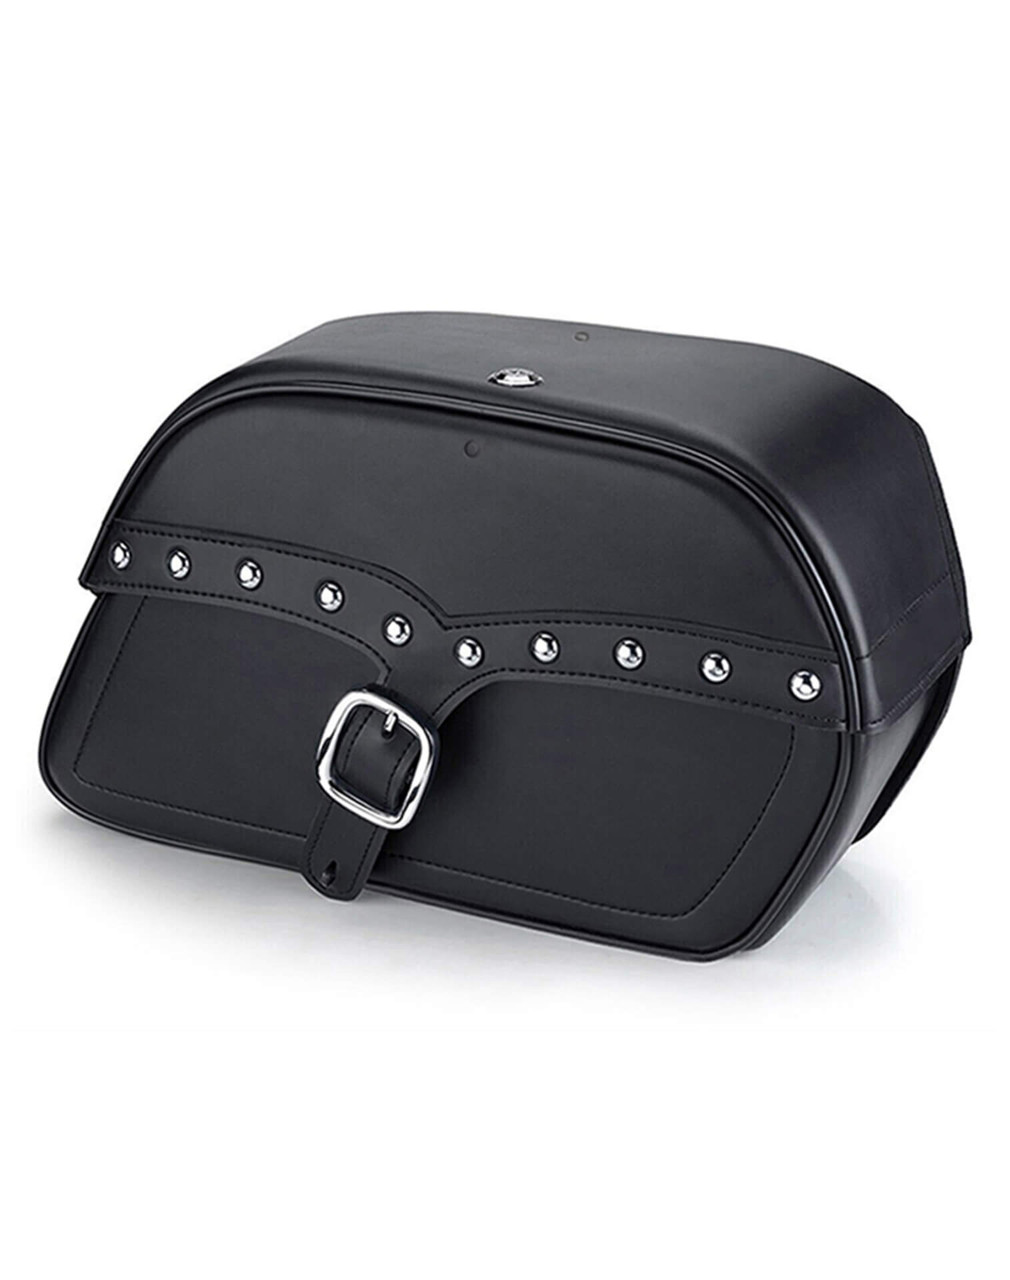 Honda 1500 Valkyrie Interstate Vikingbags Shock Cutout Single Strap Large Slanted Studded Leather Motorcycle Saddlebags Main Bag View